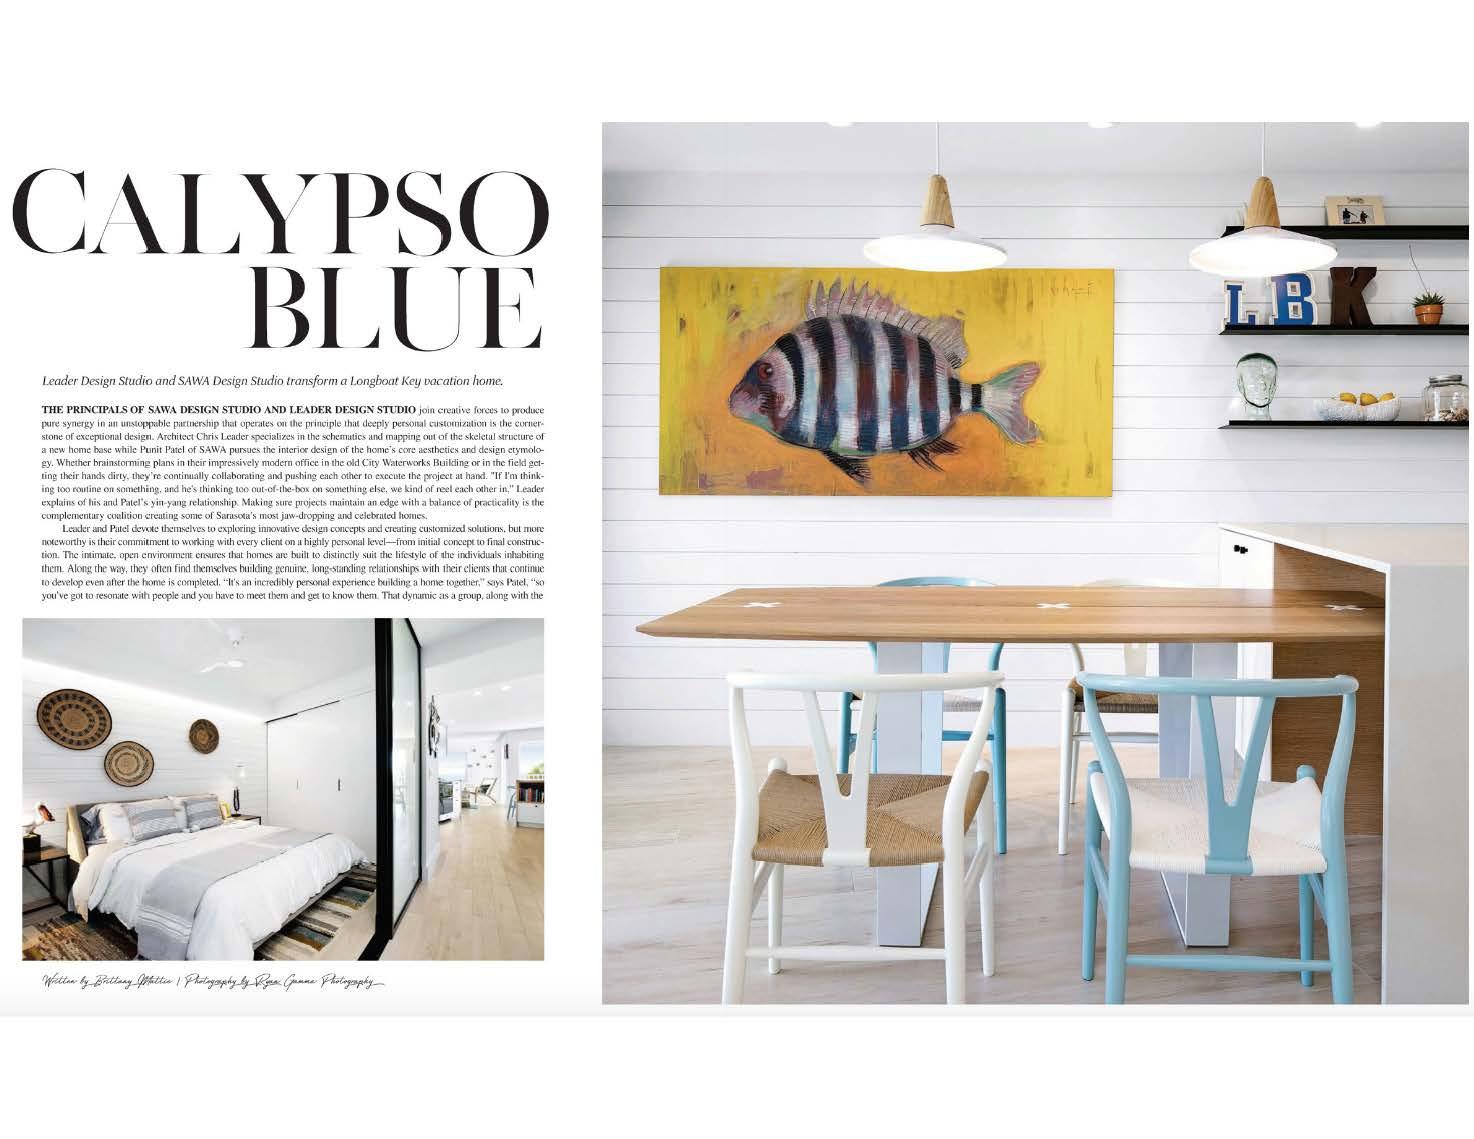 LUX 2018_Calypso Blue_Pgs1&2.jpg